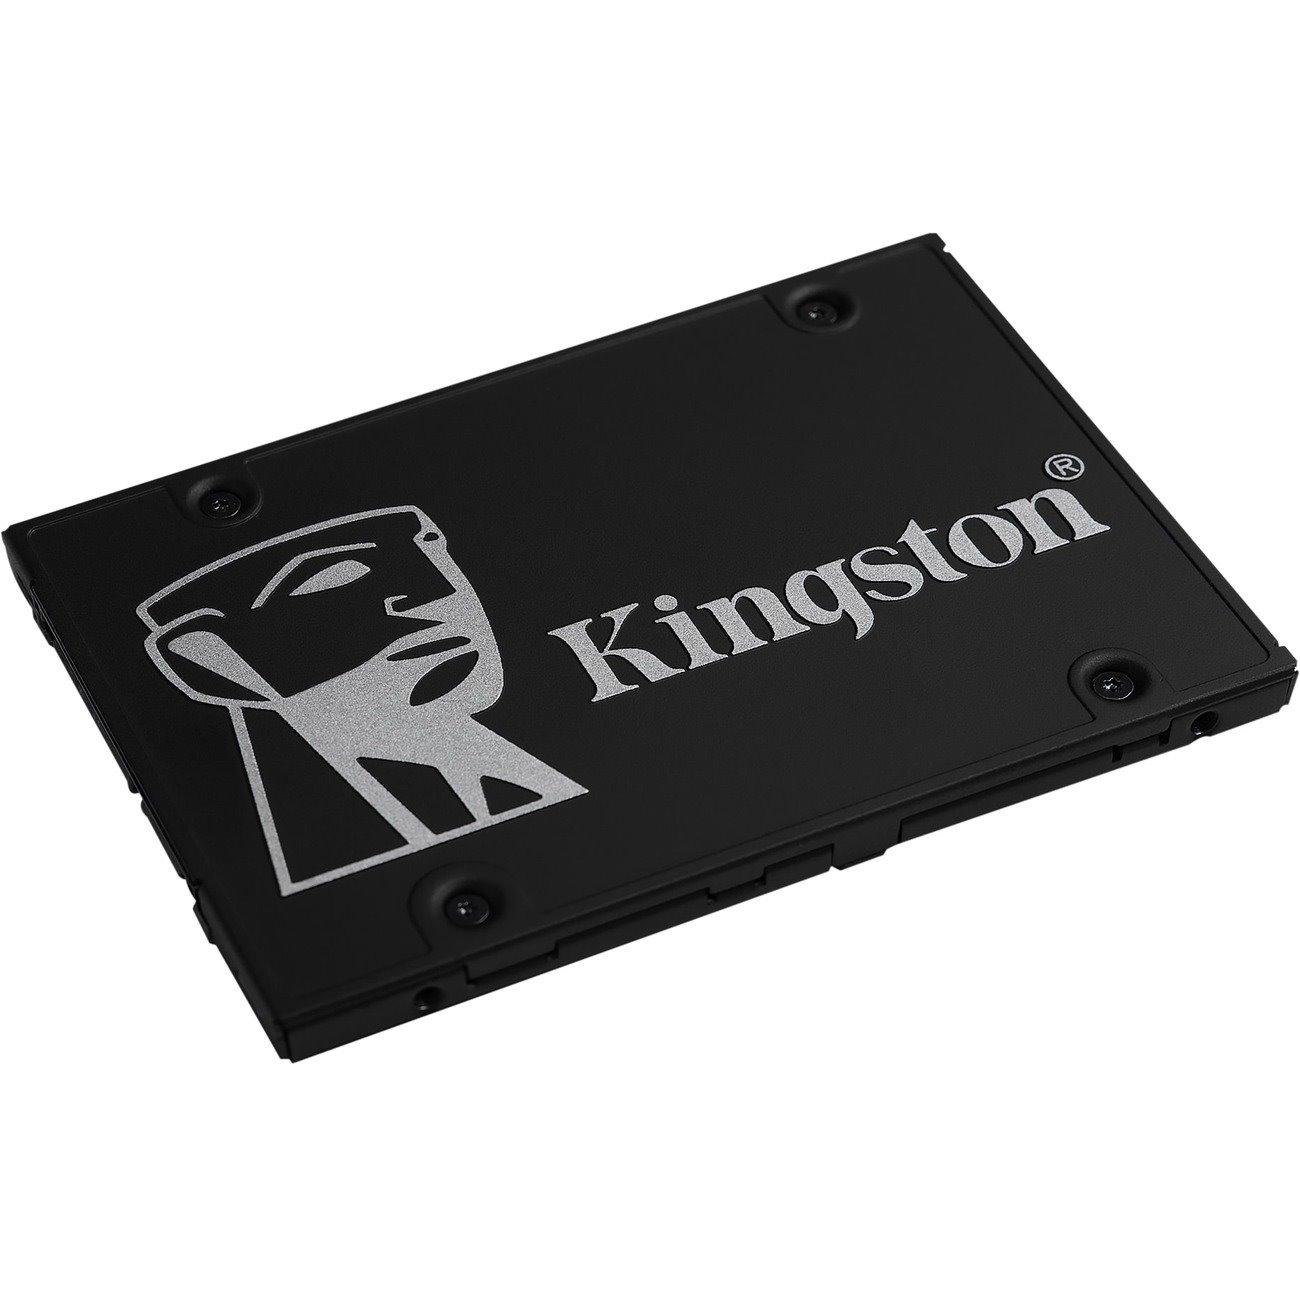 "Kingston KC600 256 GB Solid State Drive - 2.5"" Internal - SATA (SATA/600)"